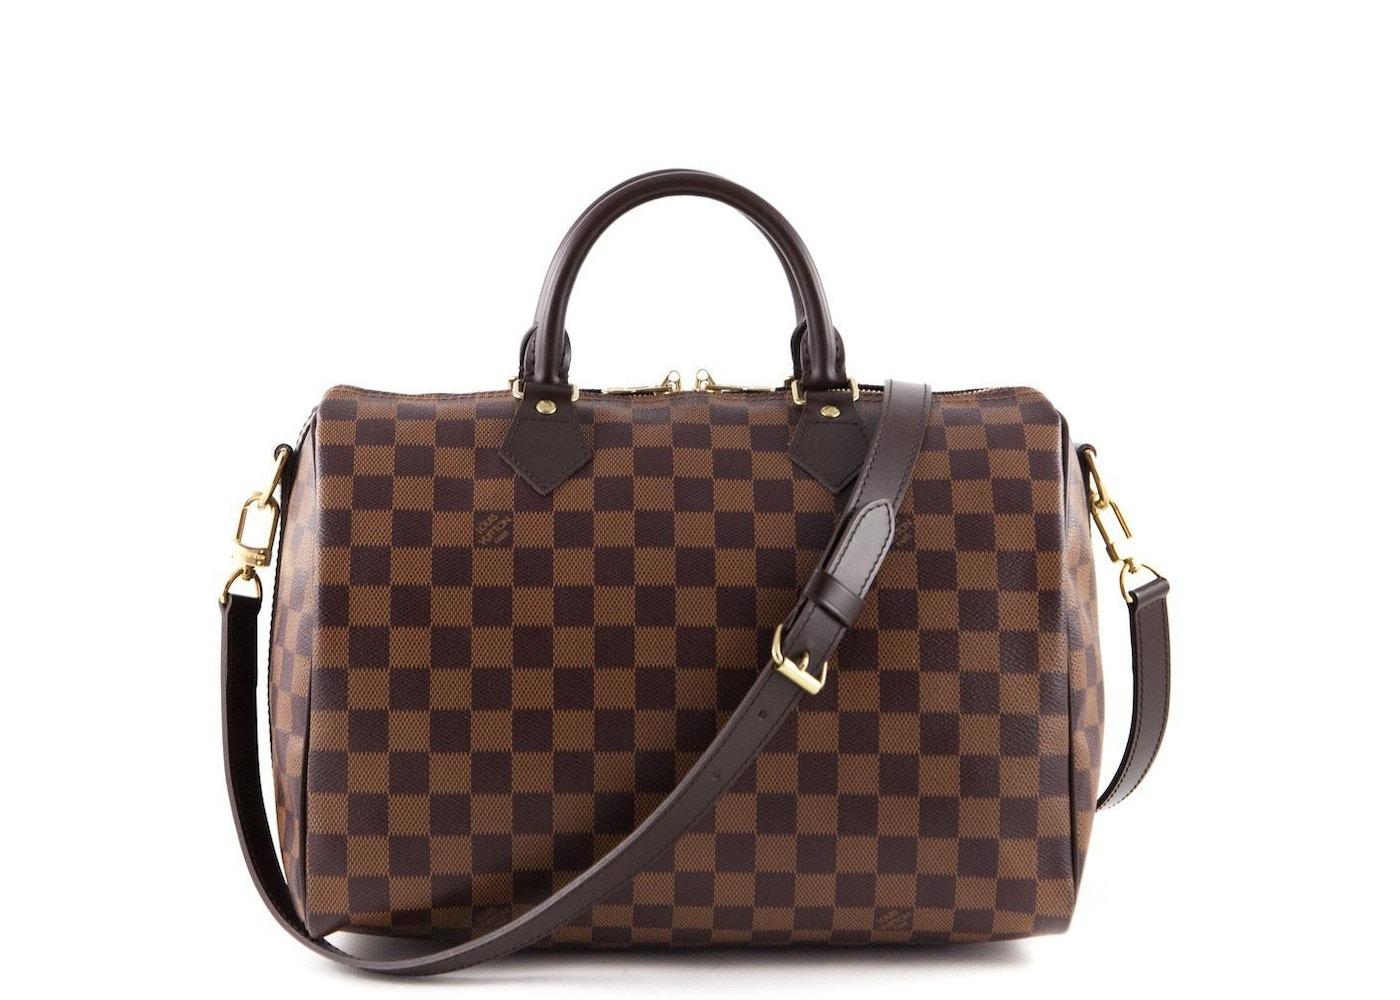 96f2ac4bd03 Louis Vuitton Speedy Bandouliere Damier Ebene (Without Accessories) 30 Brown